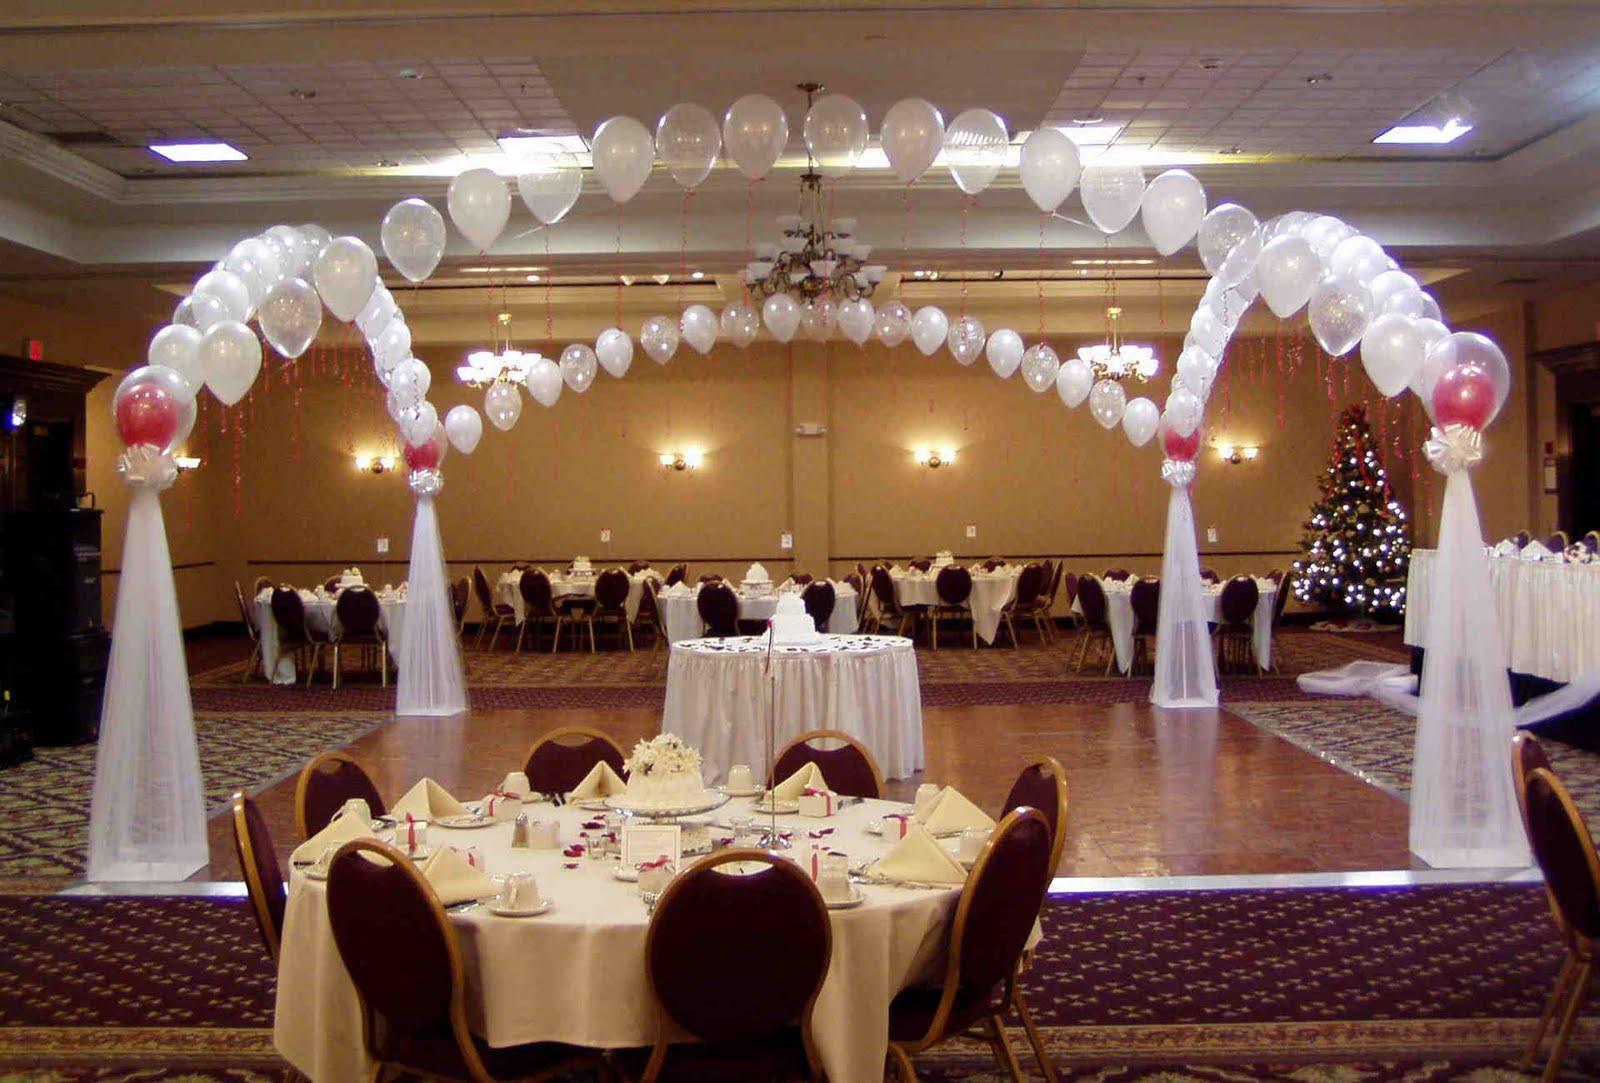 Wedding Decorations: Wedding Flowers: Cheap Wedding Decorations